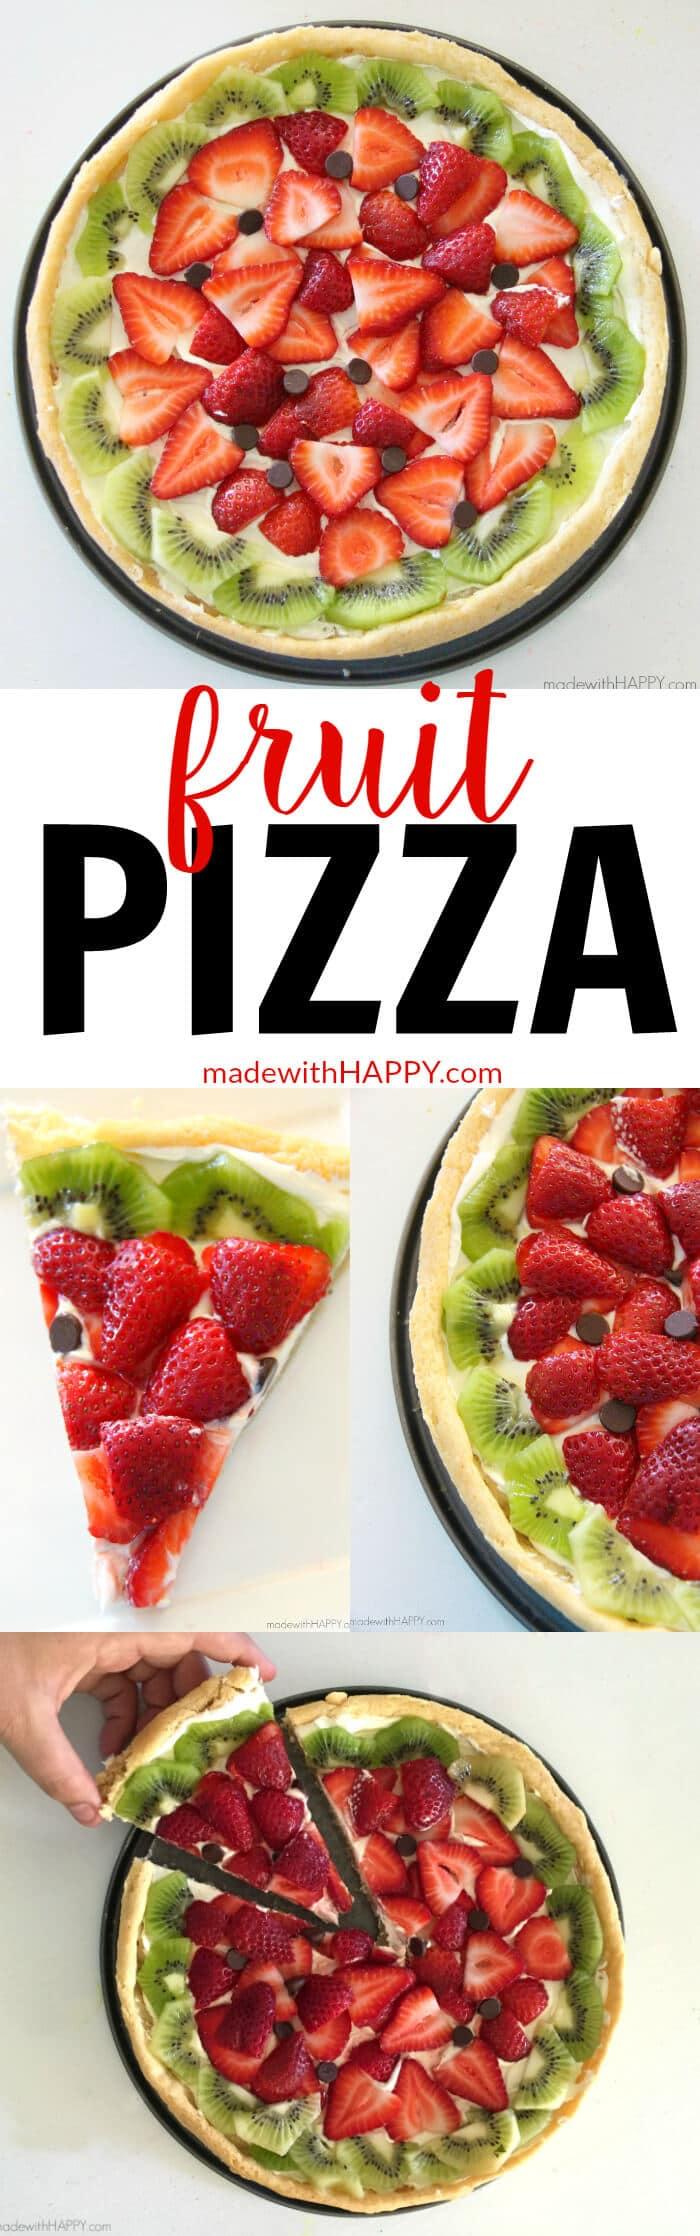 Fruit Pizzas | Watermelon Shaped Desserts | Summer Desserts | Cookie Pizzas | Watermelon Dessert | www.madewithhappy.com